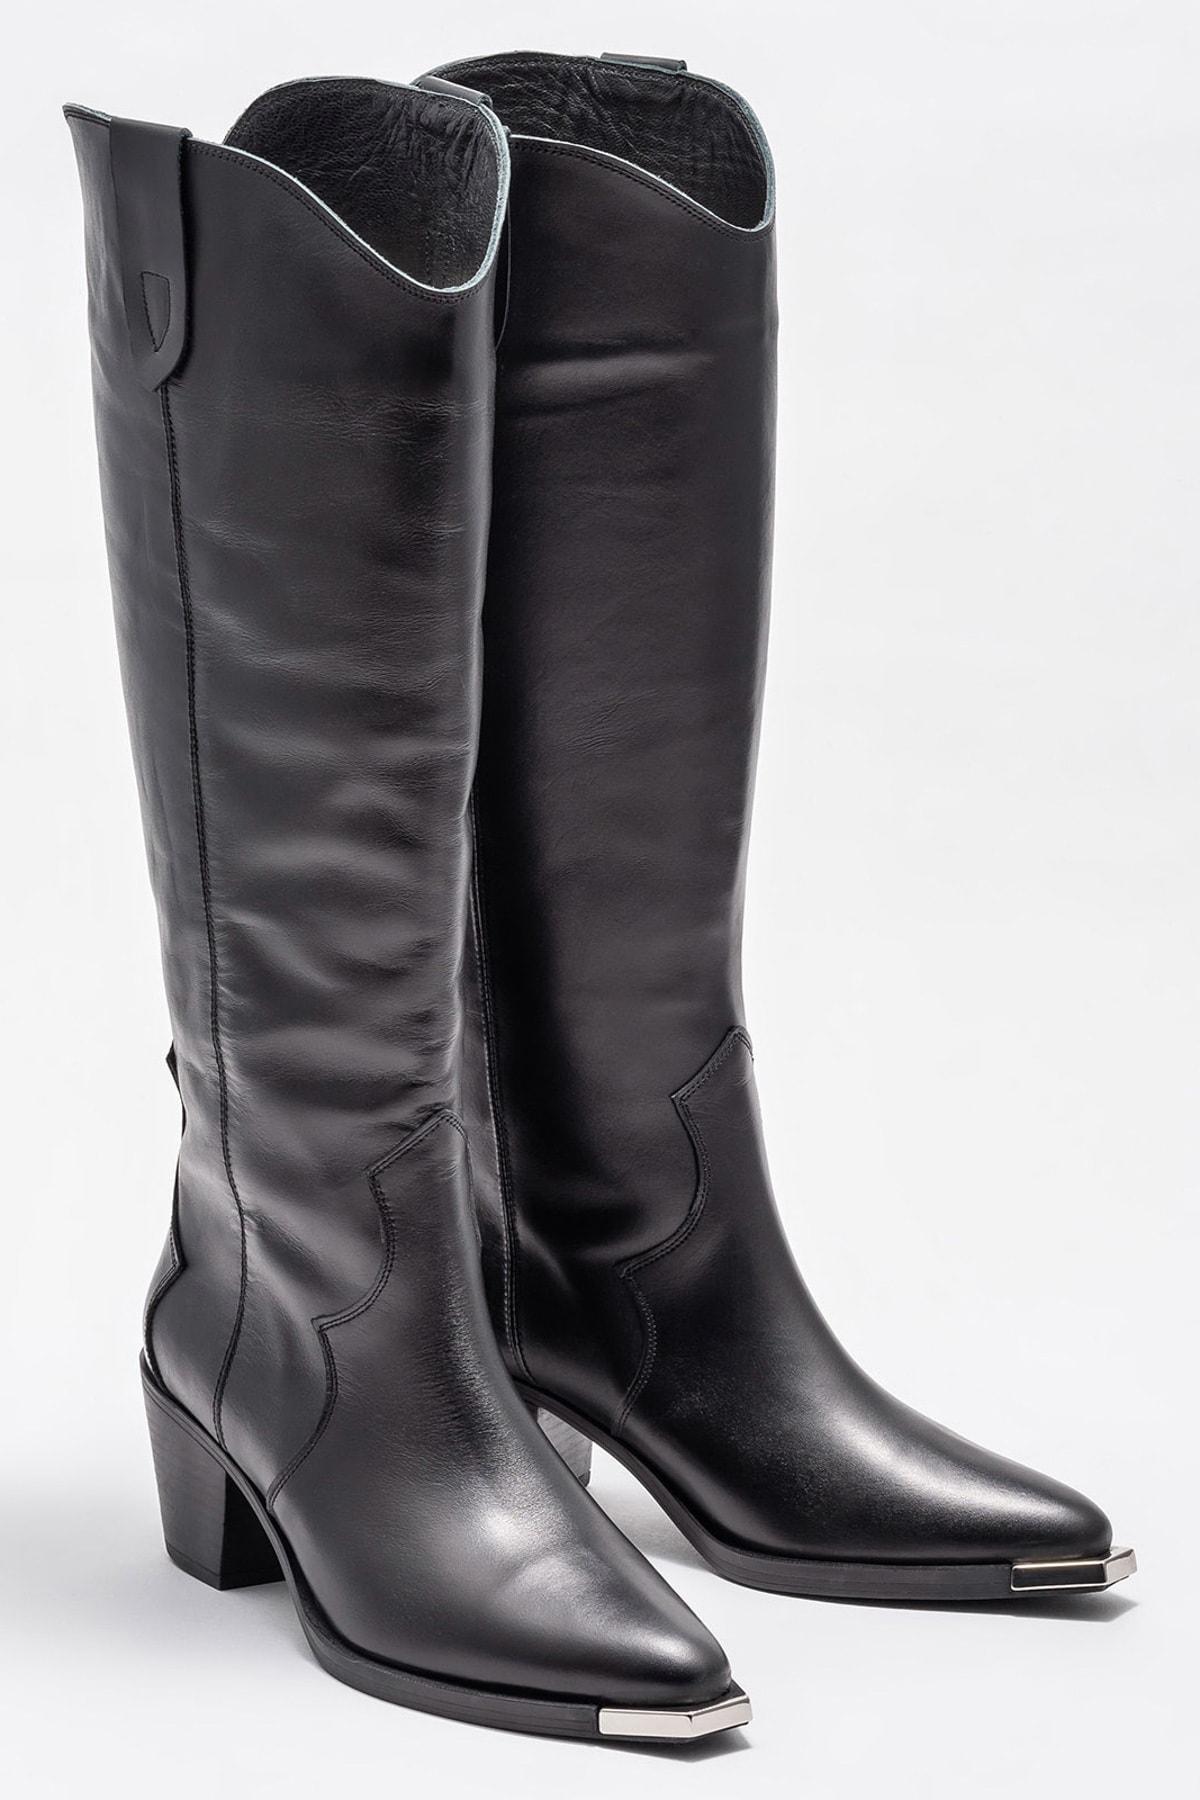 Elle Shoes Kadın Çizme 20KBS88214 2